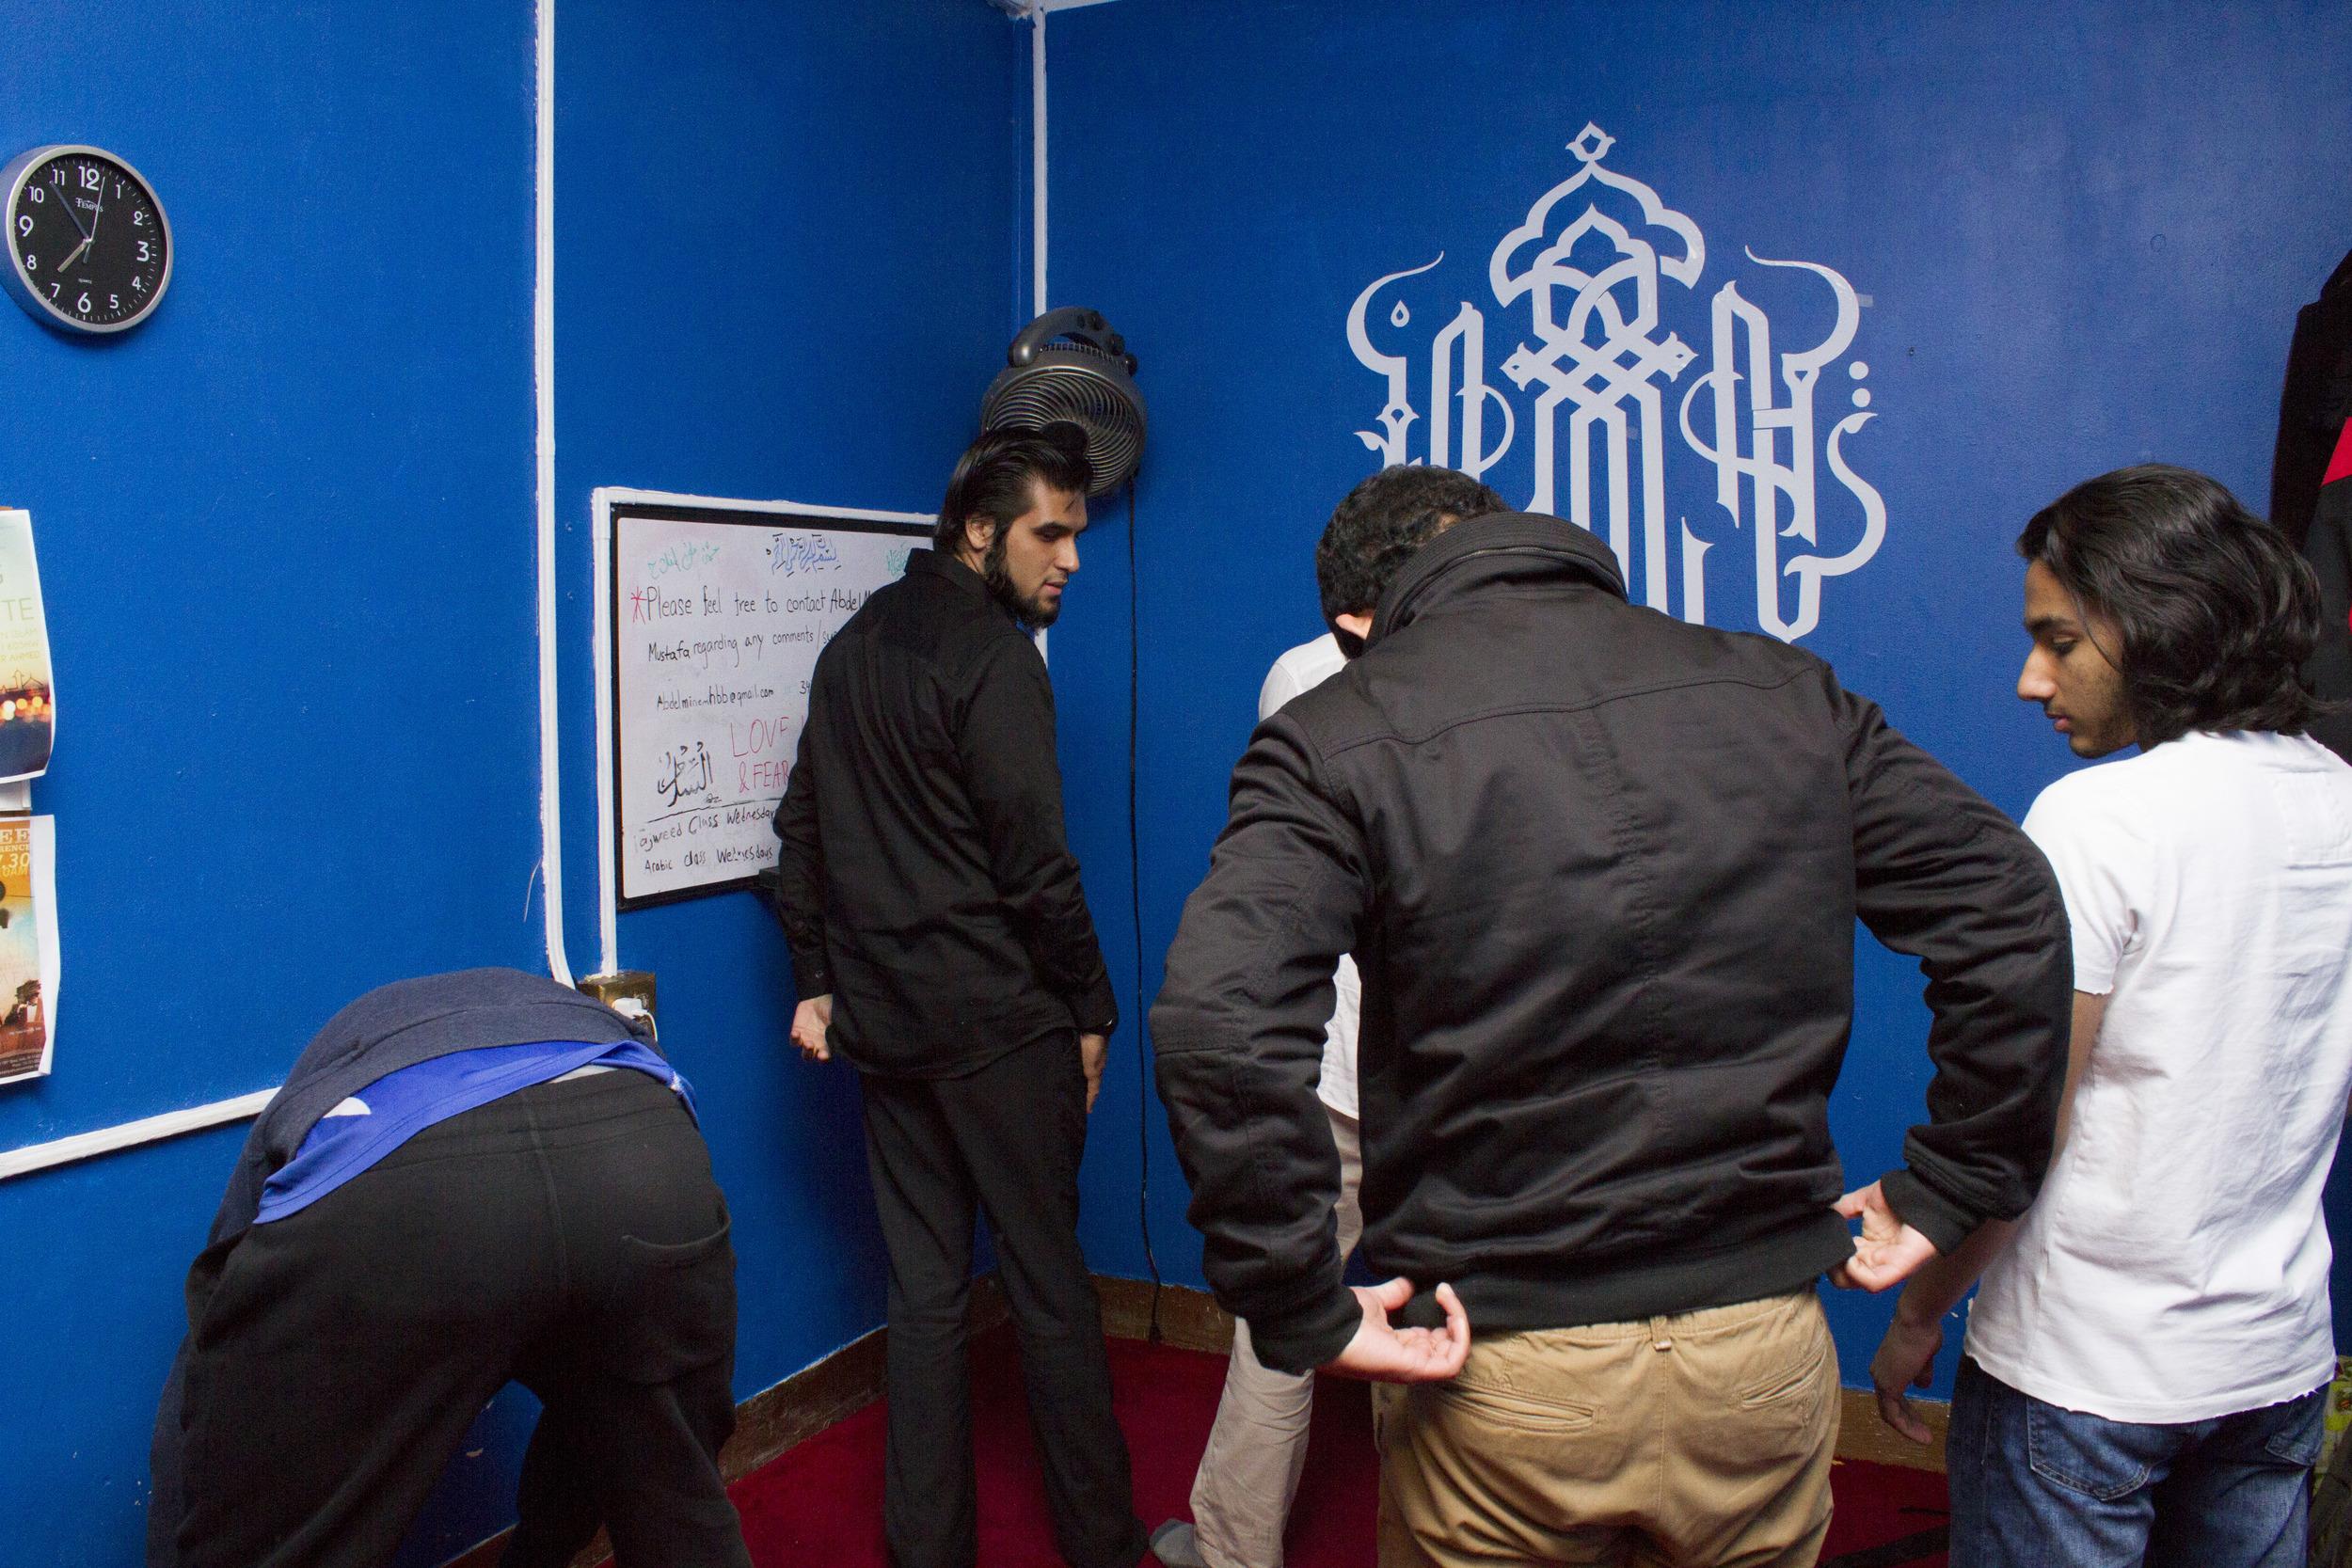 Navel Shah, 19, prays inside the school's Muslim prayer room.